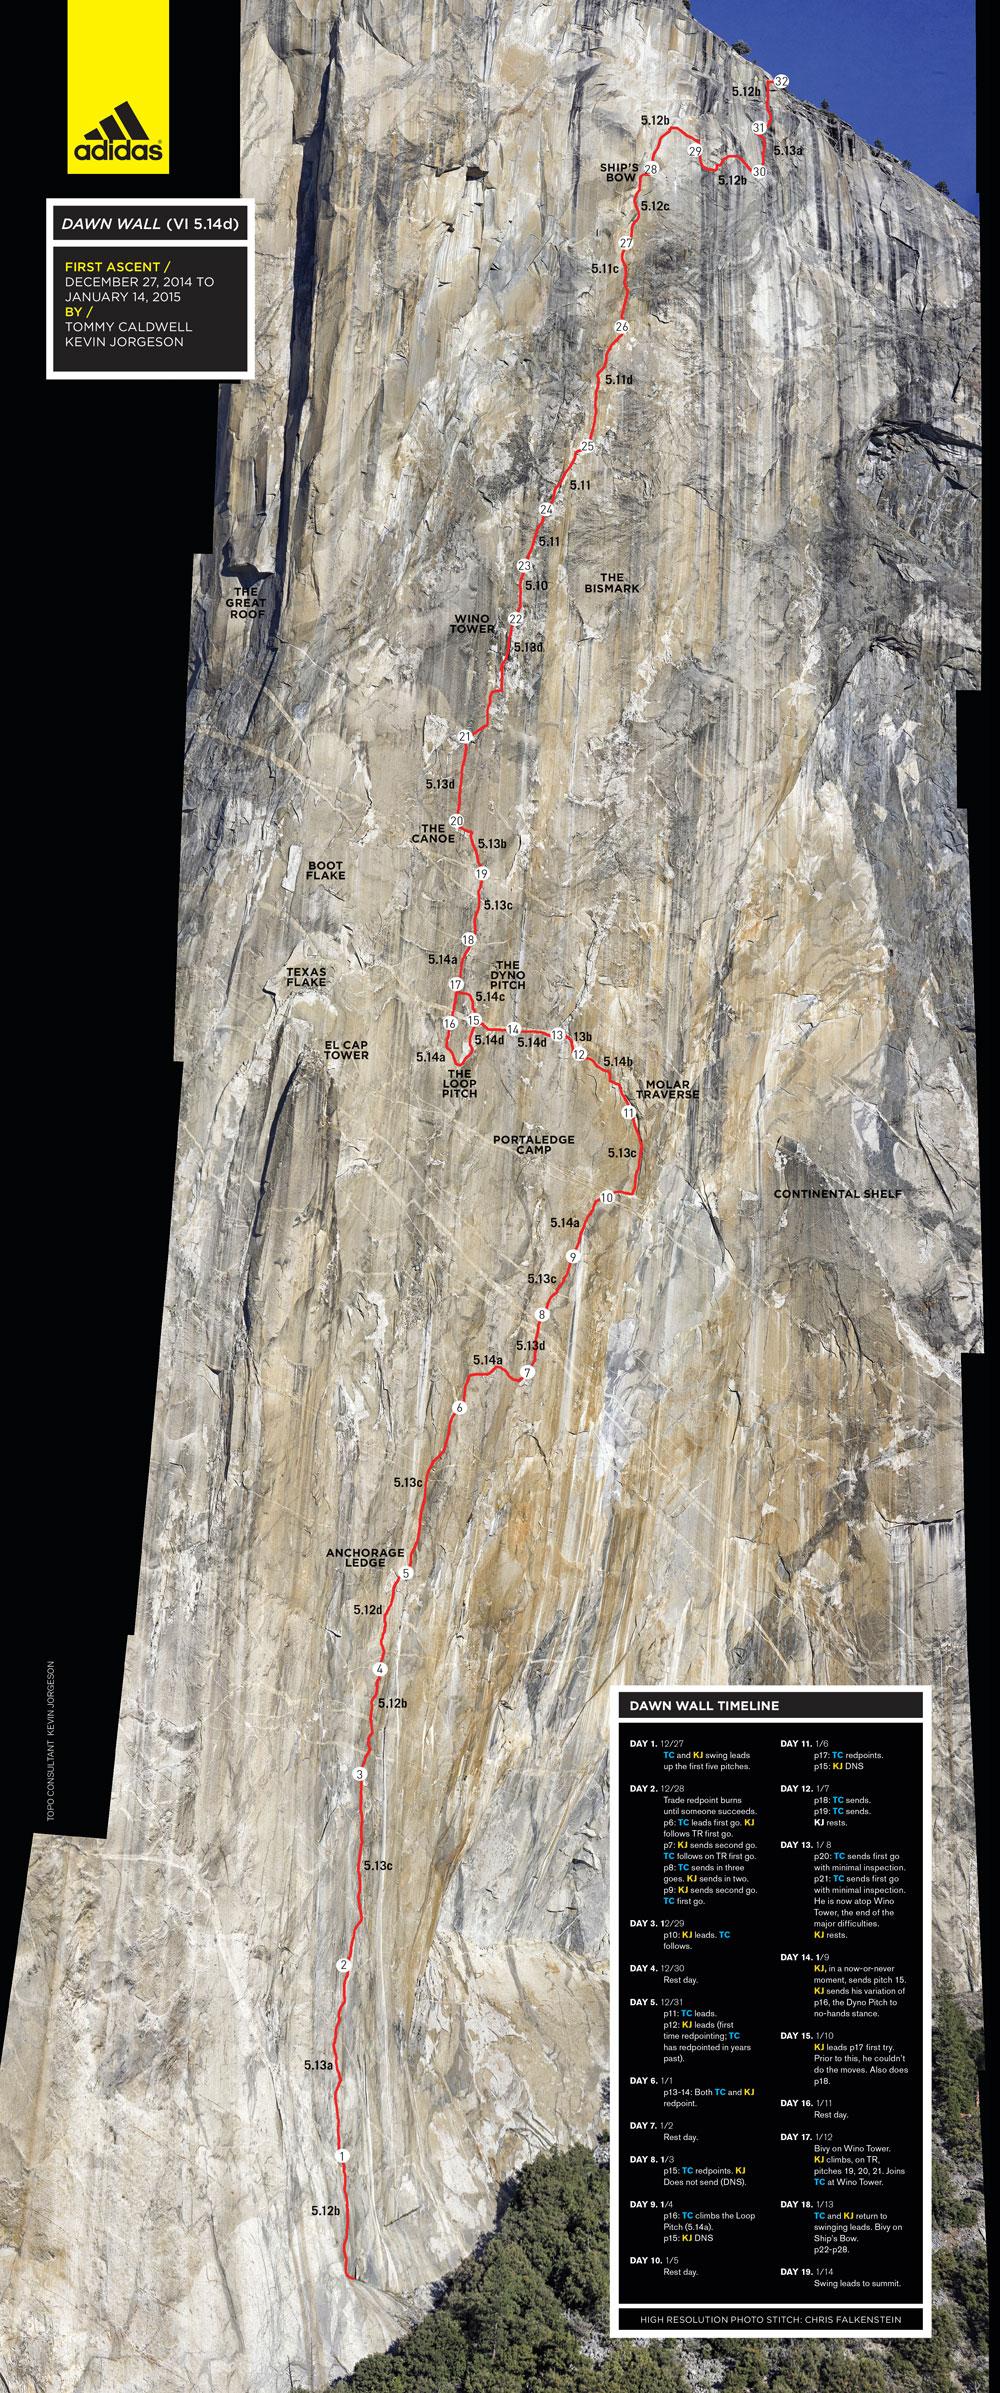 Croquis Down Wall Yosemite